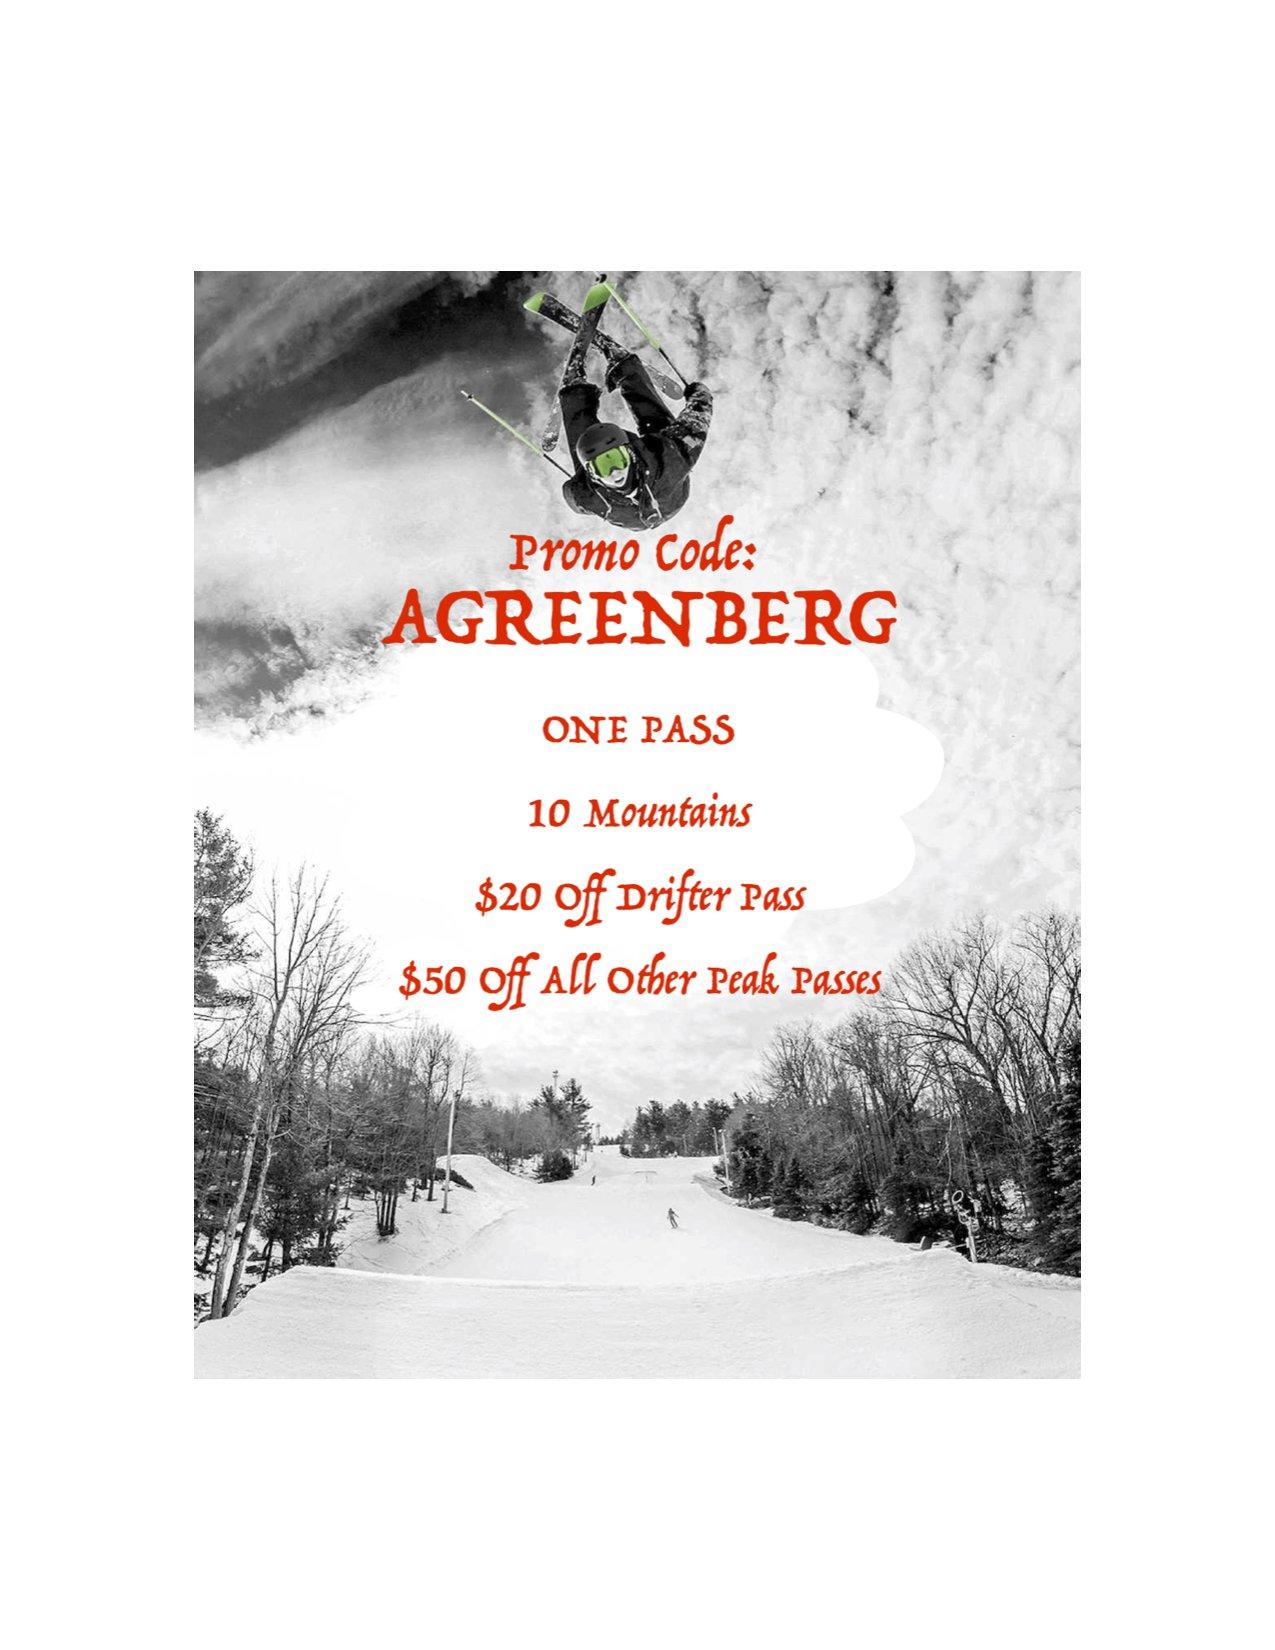 Promo Code For All Peak Passes! Use Code: AGREENBERG